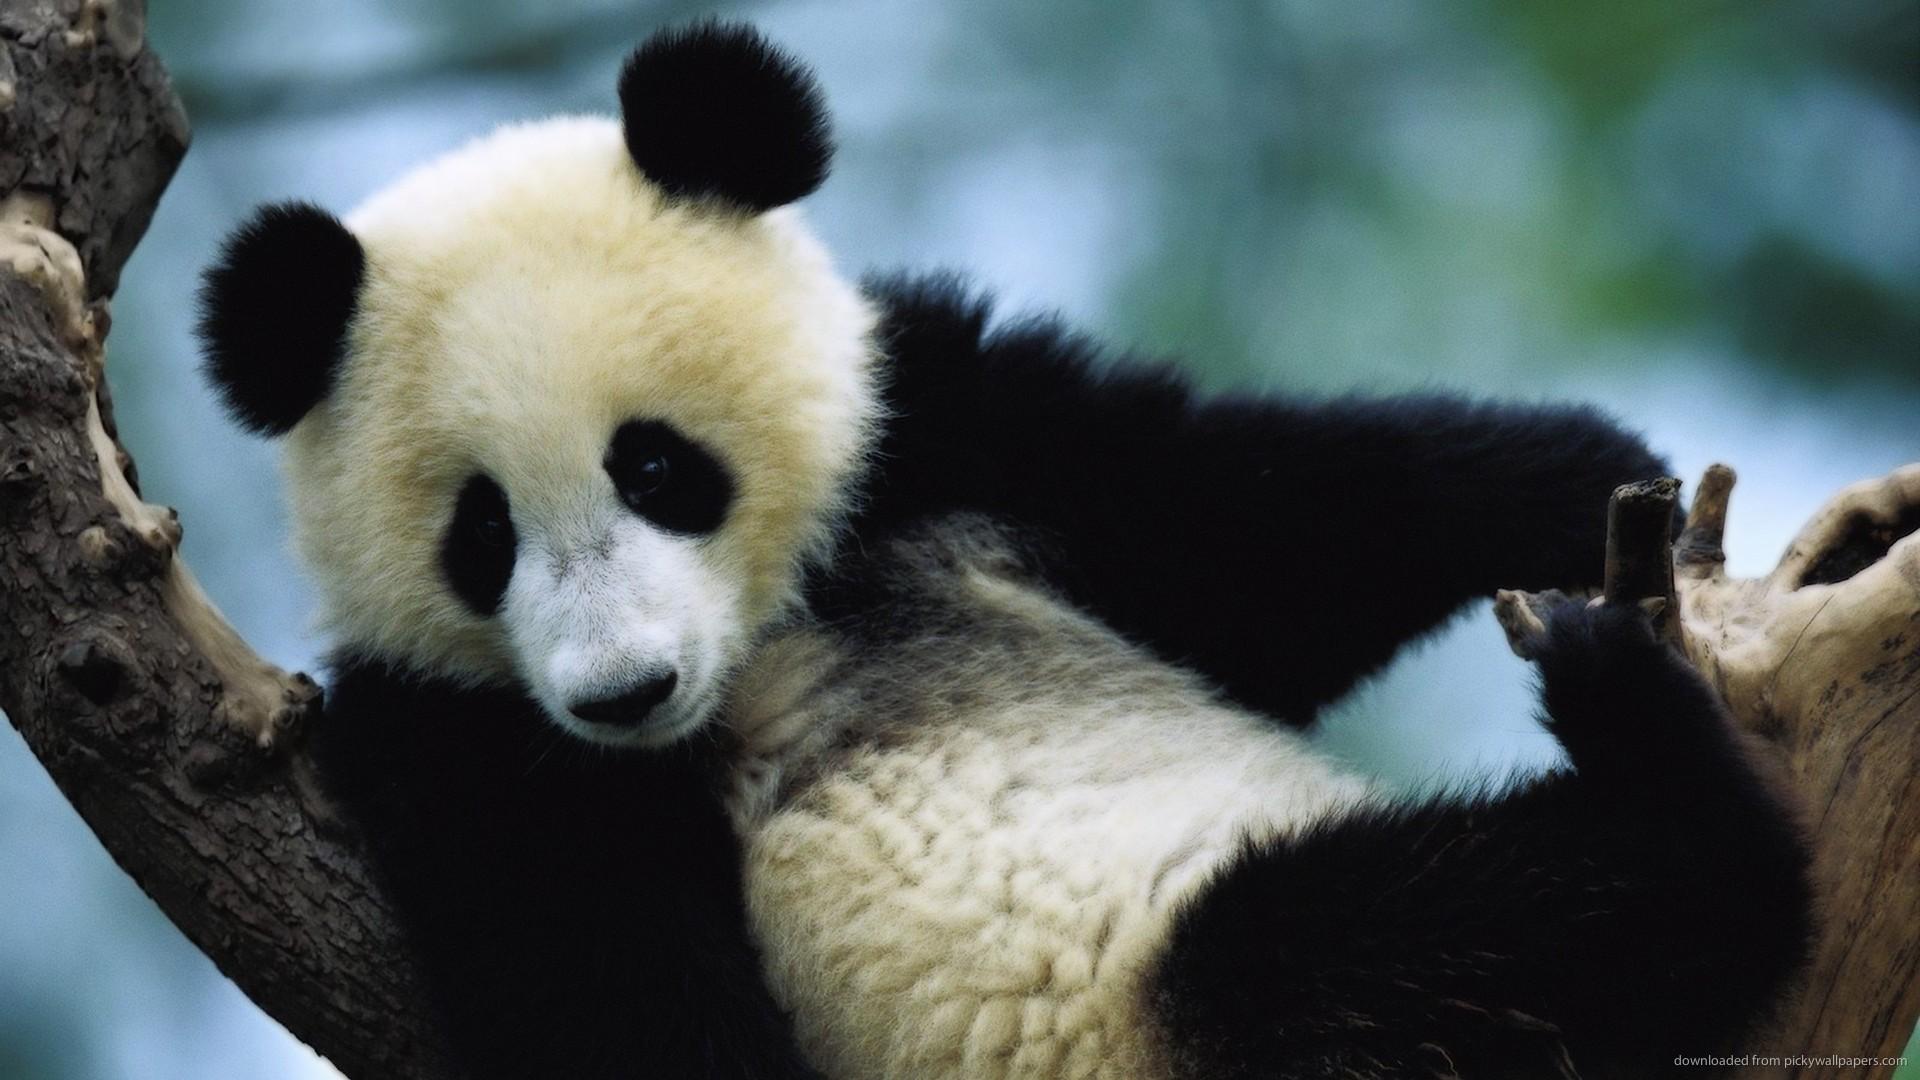 Little Panda Bear On A Tree picture